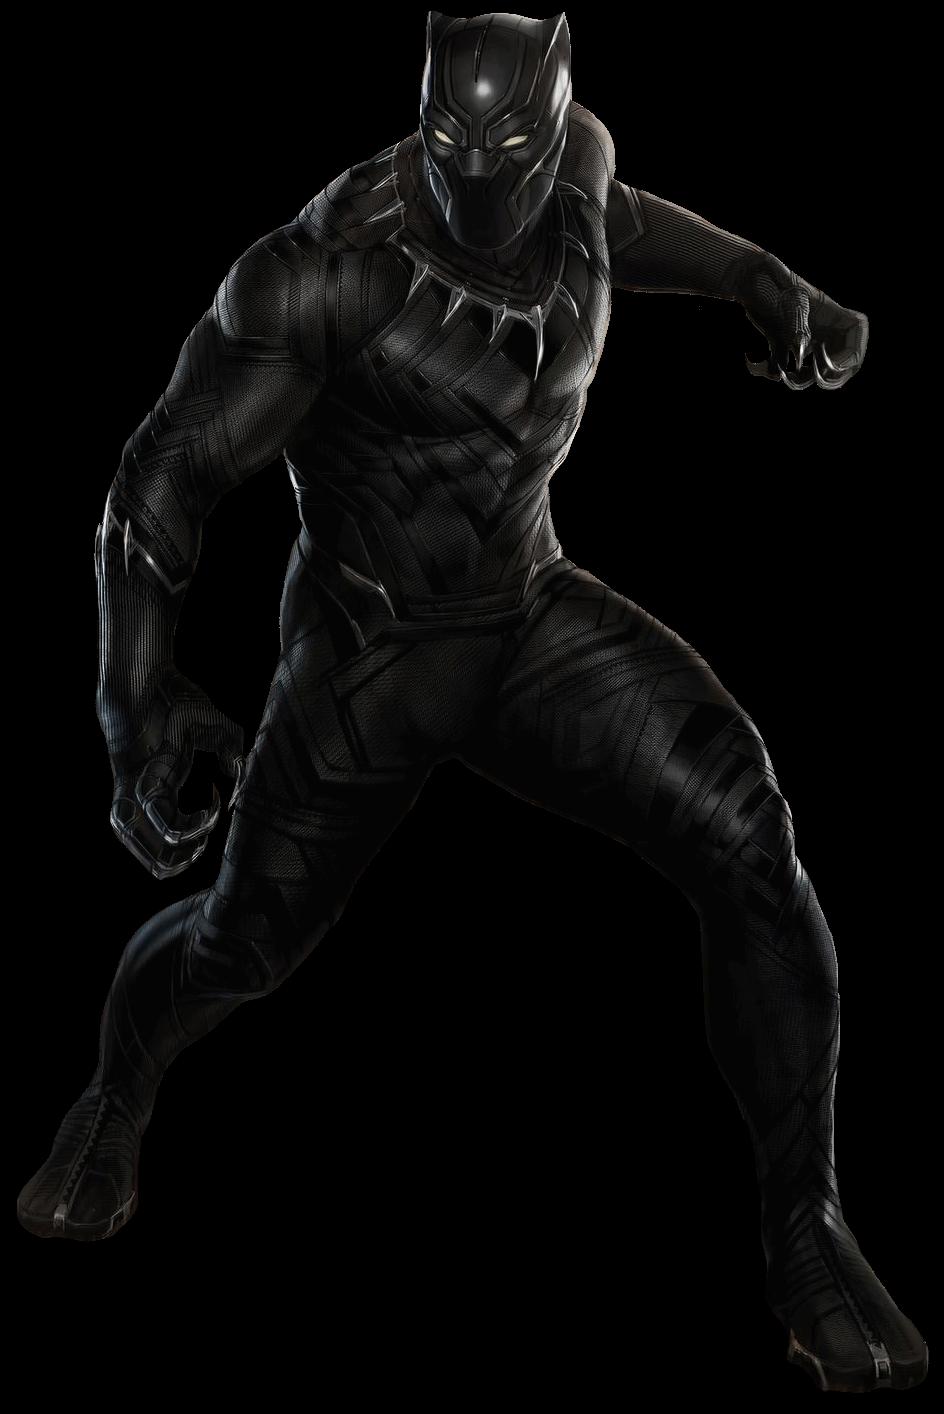 Black Panther (Marvel Cinematic Universe) | Heroes Wiki ...